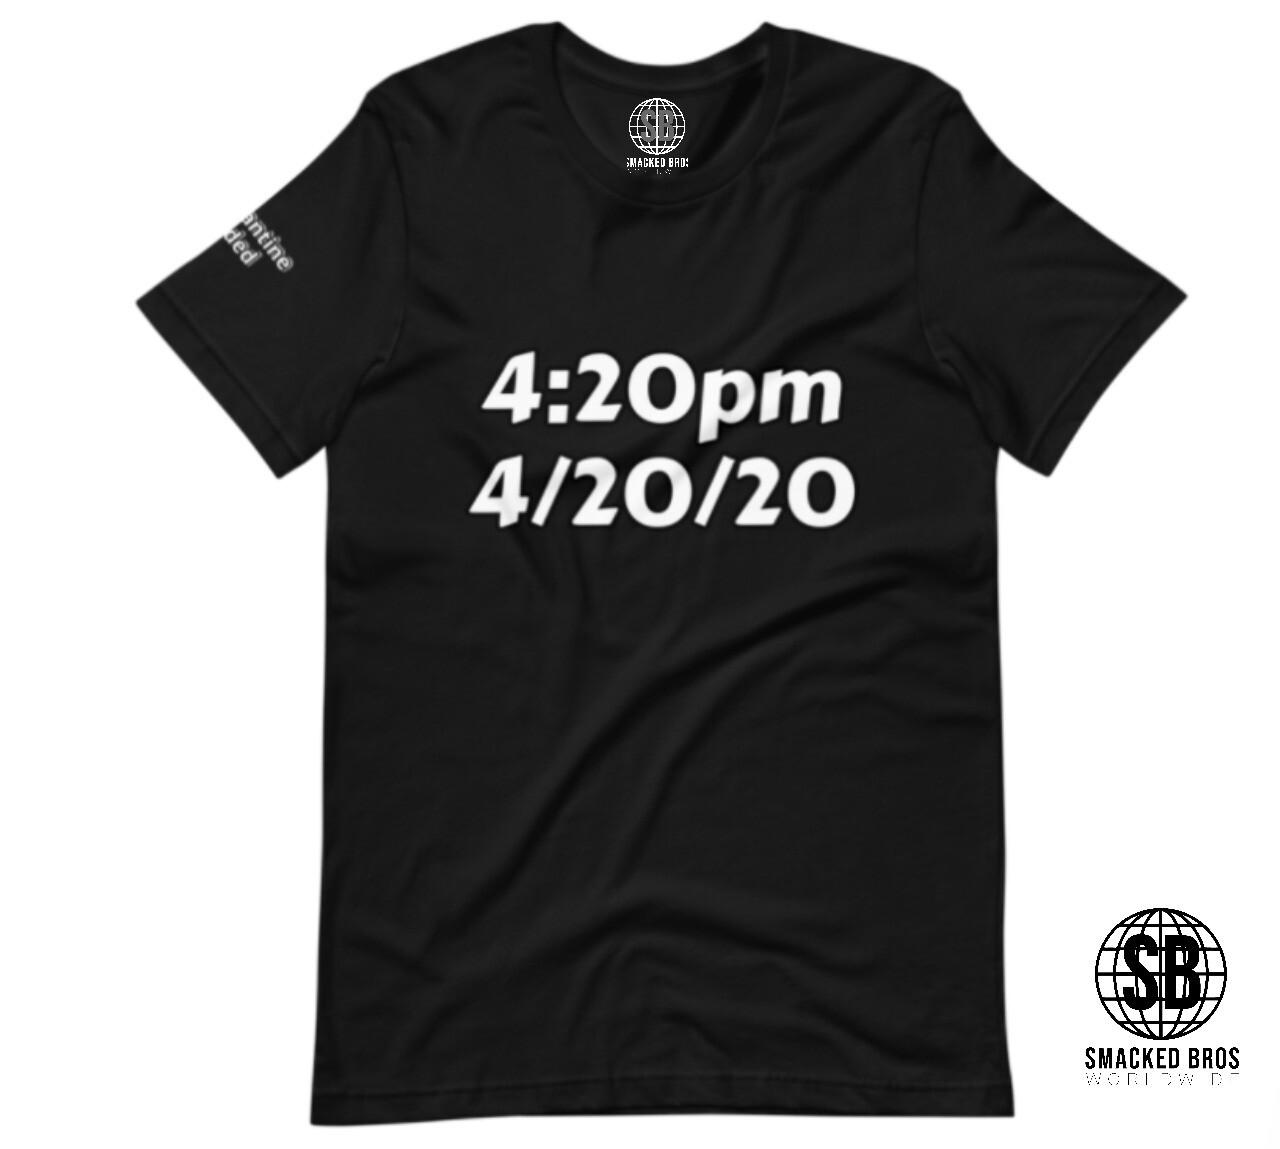 4:20 on 4/20/20